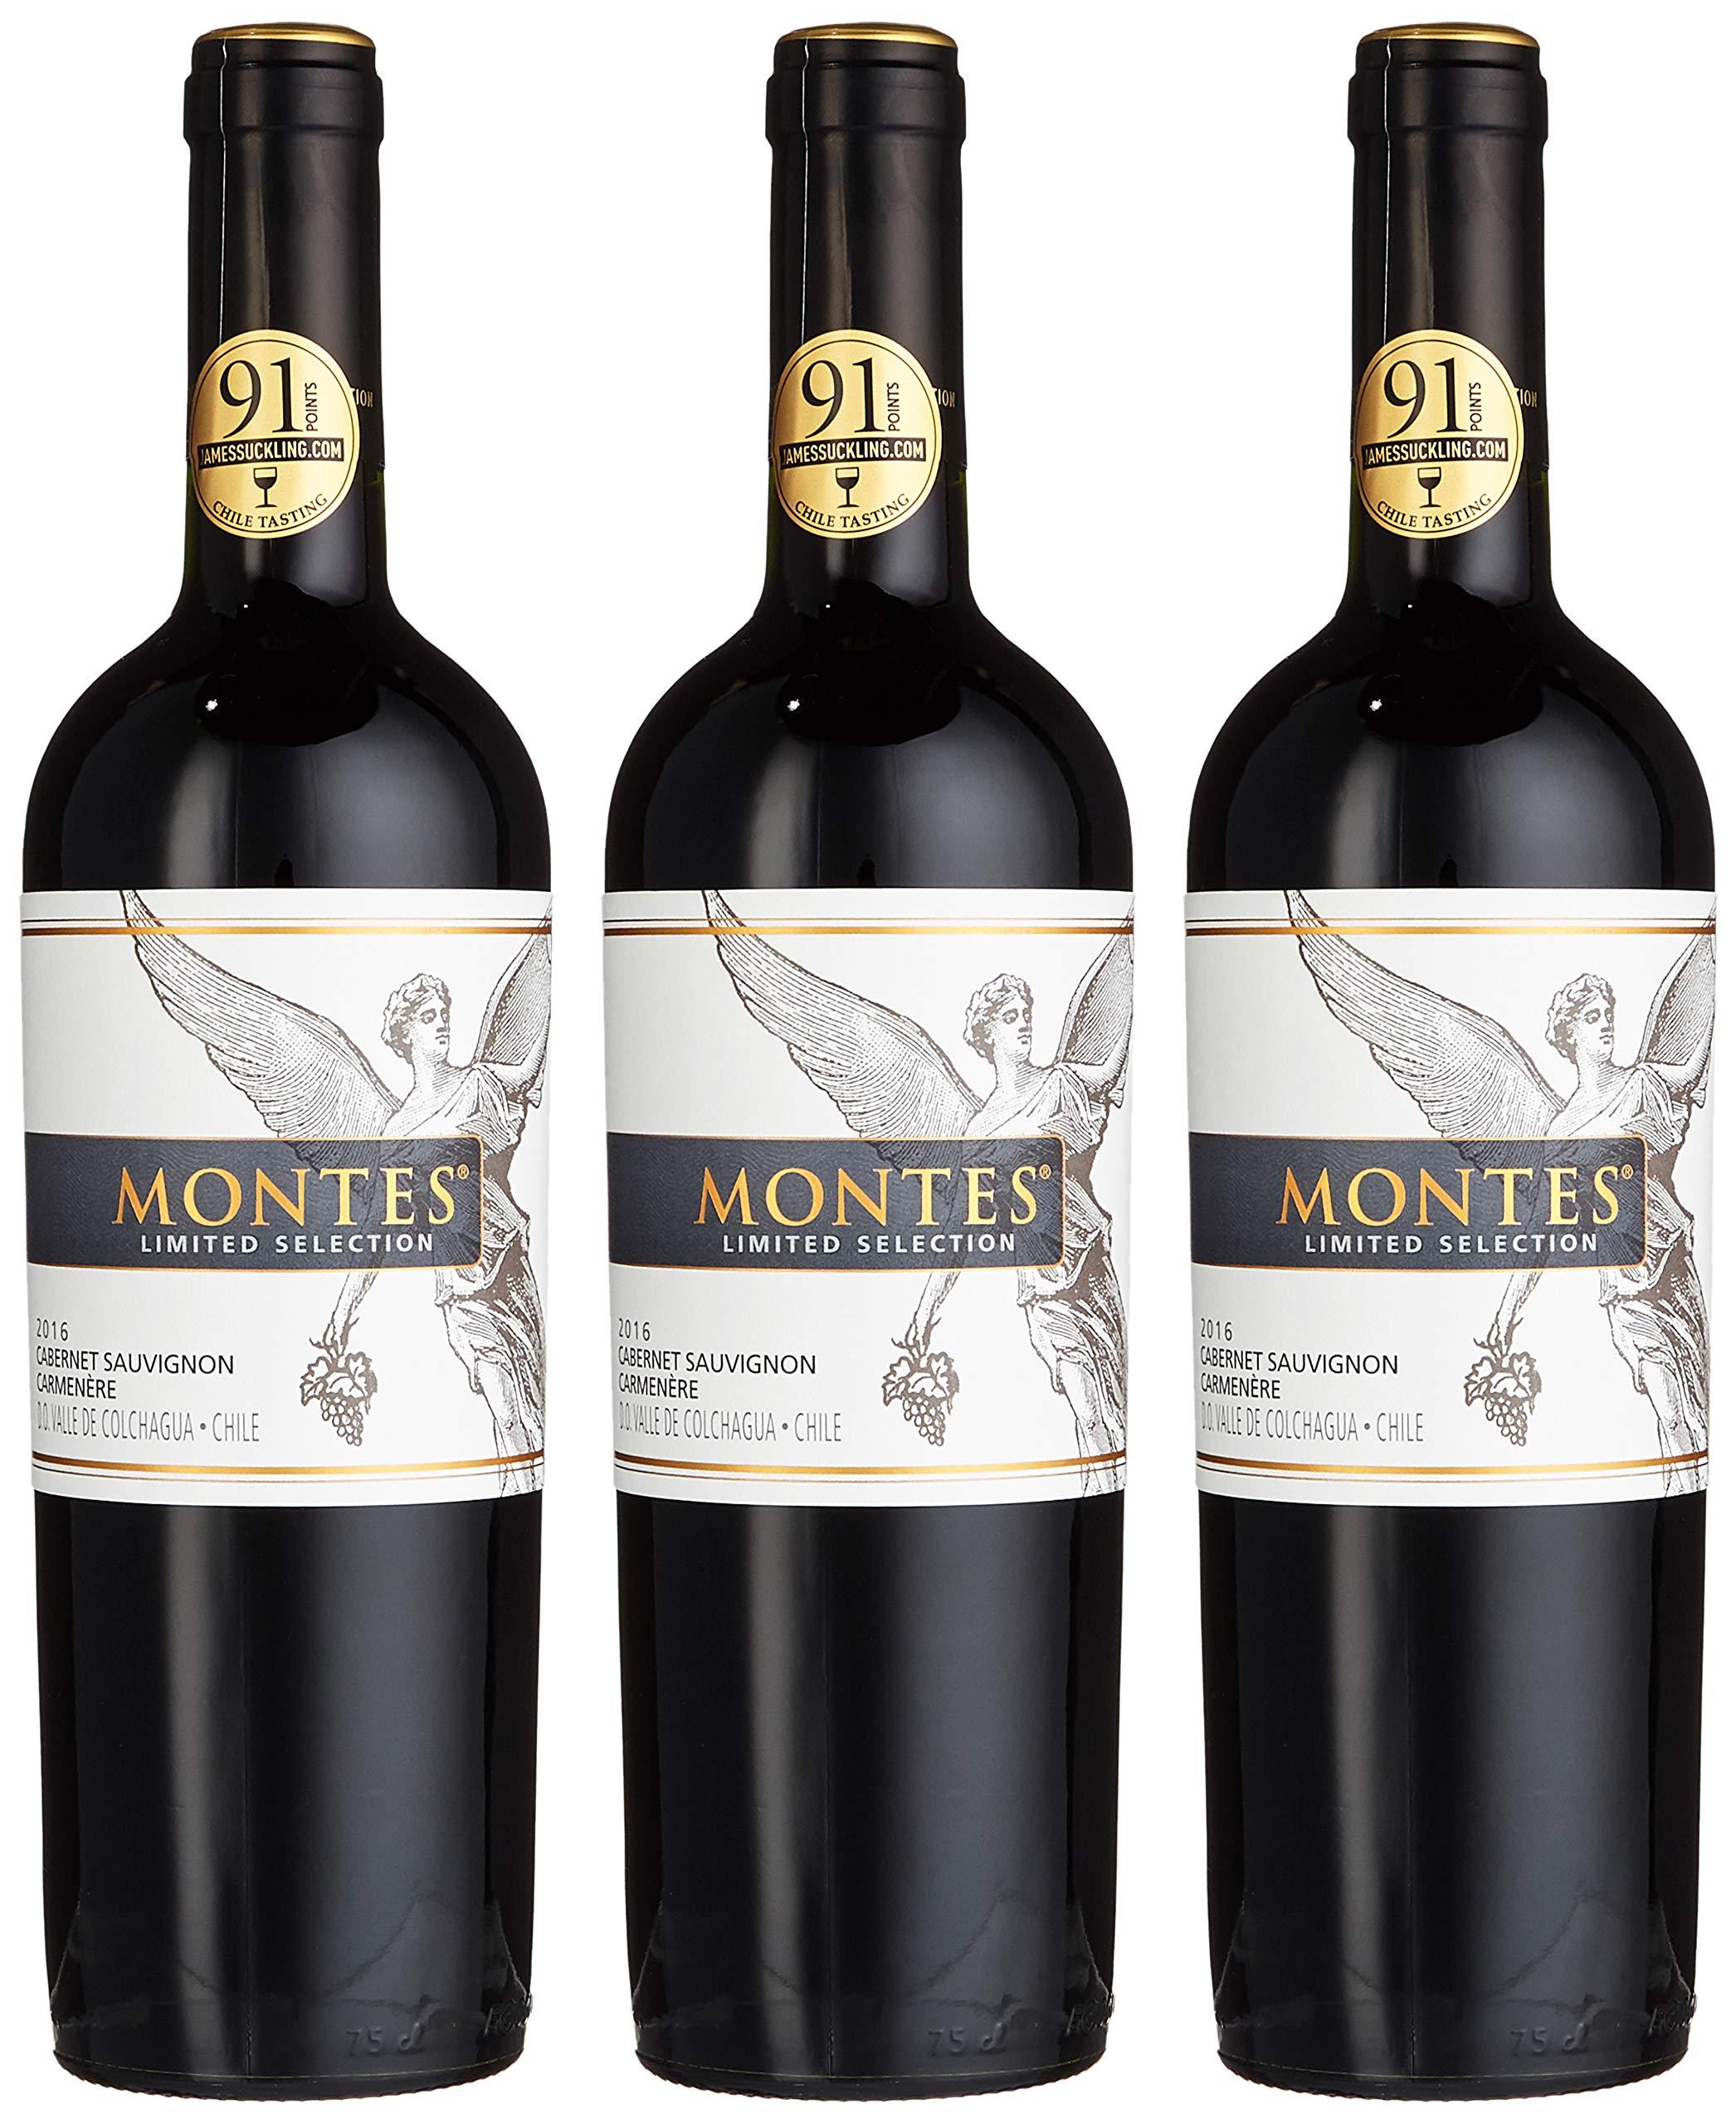 Montes-Cabernet-Sauvignon-Carmenere-3-x-075-l